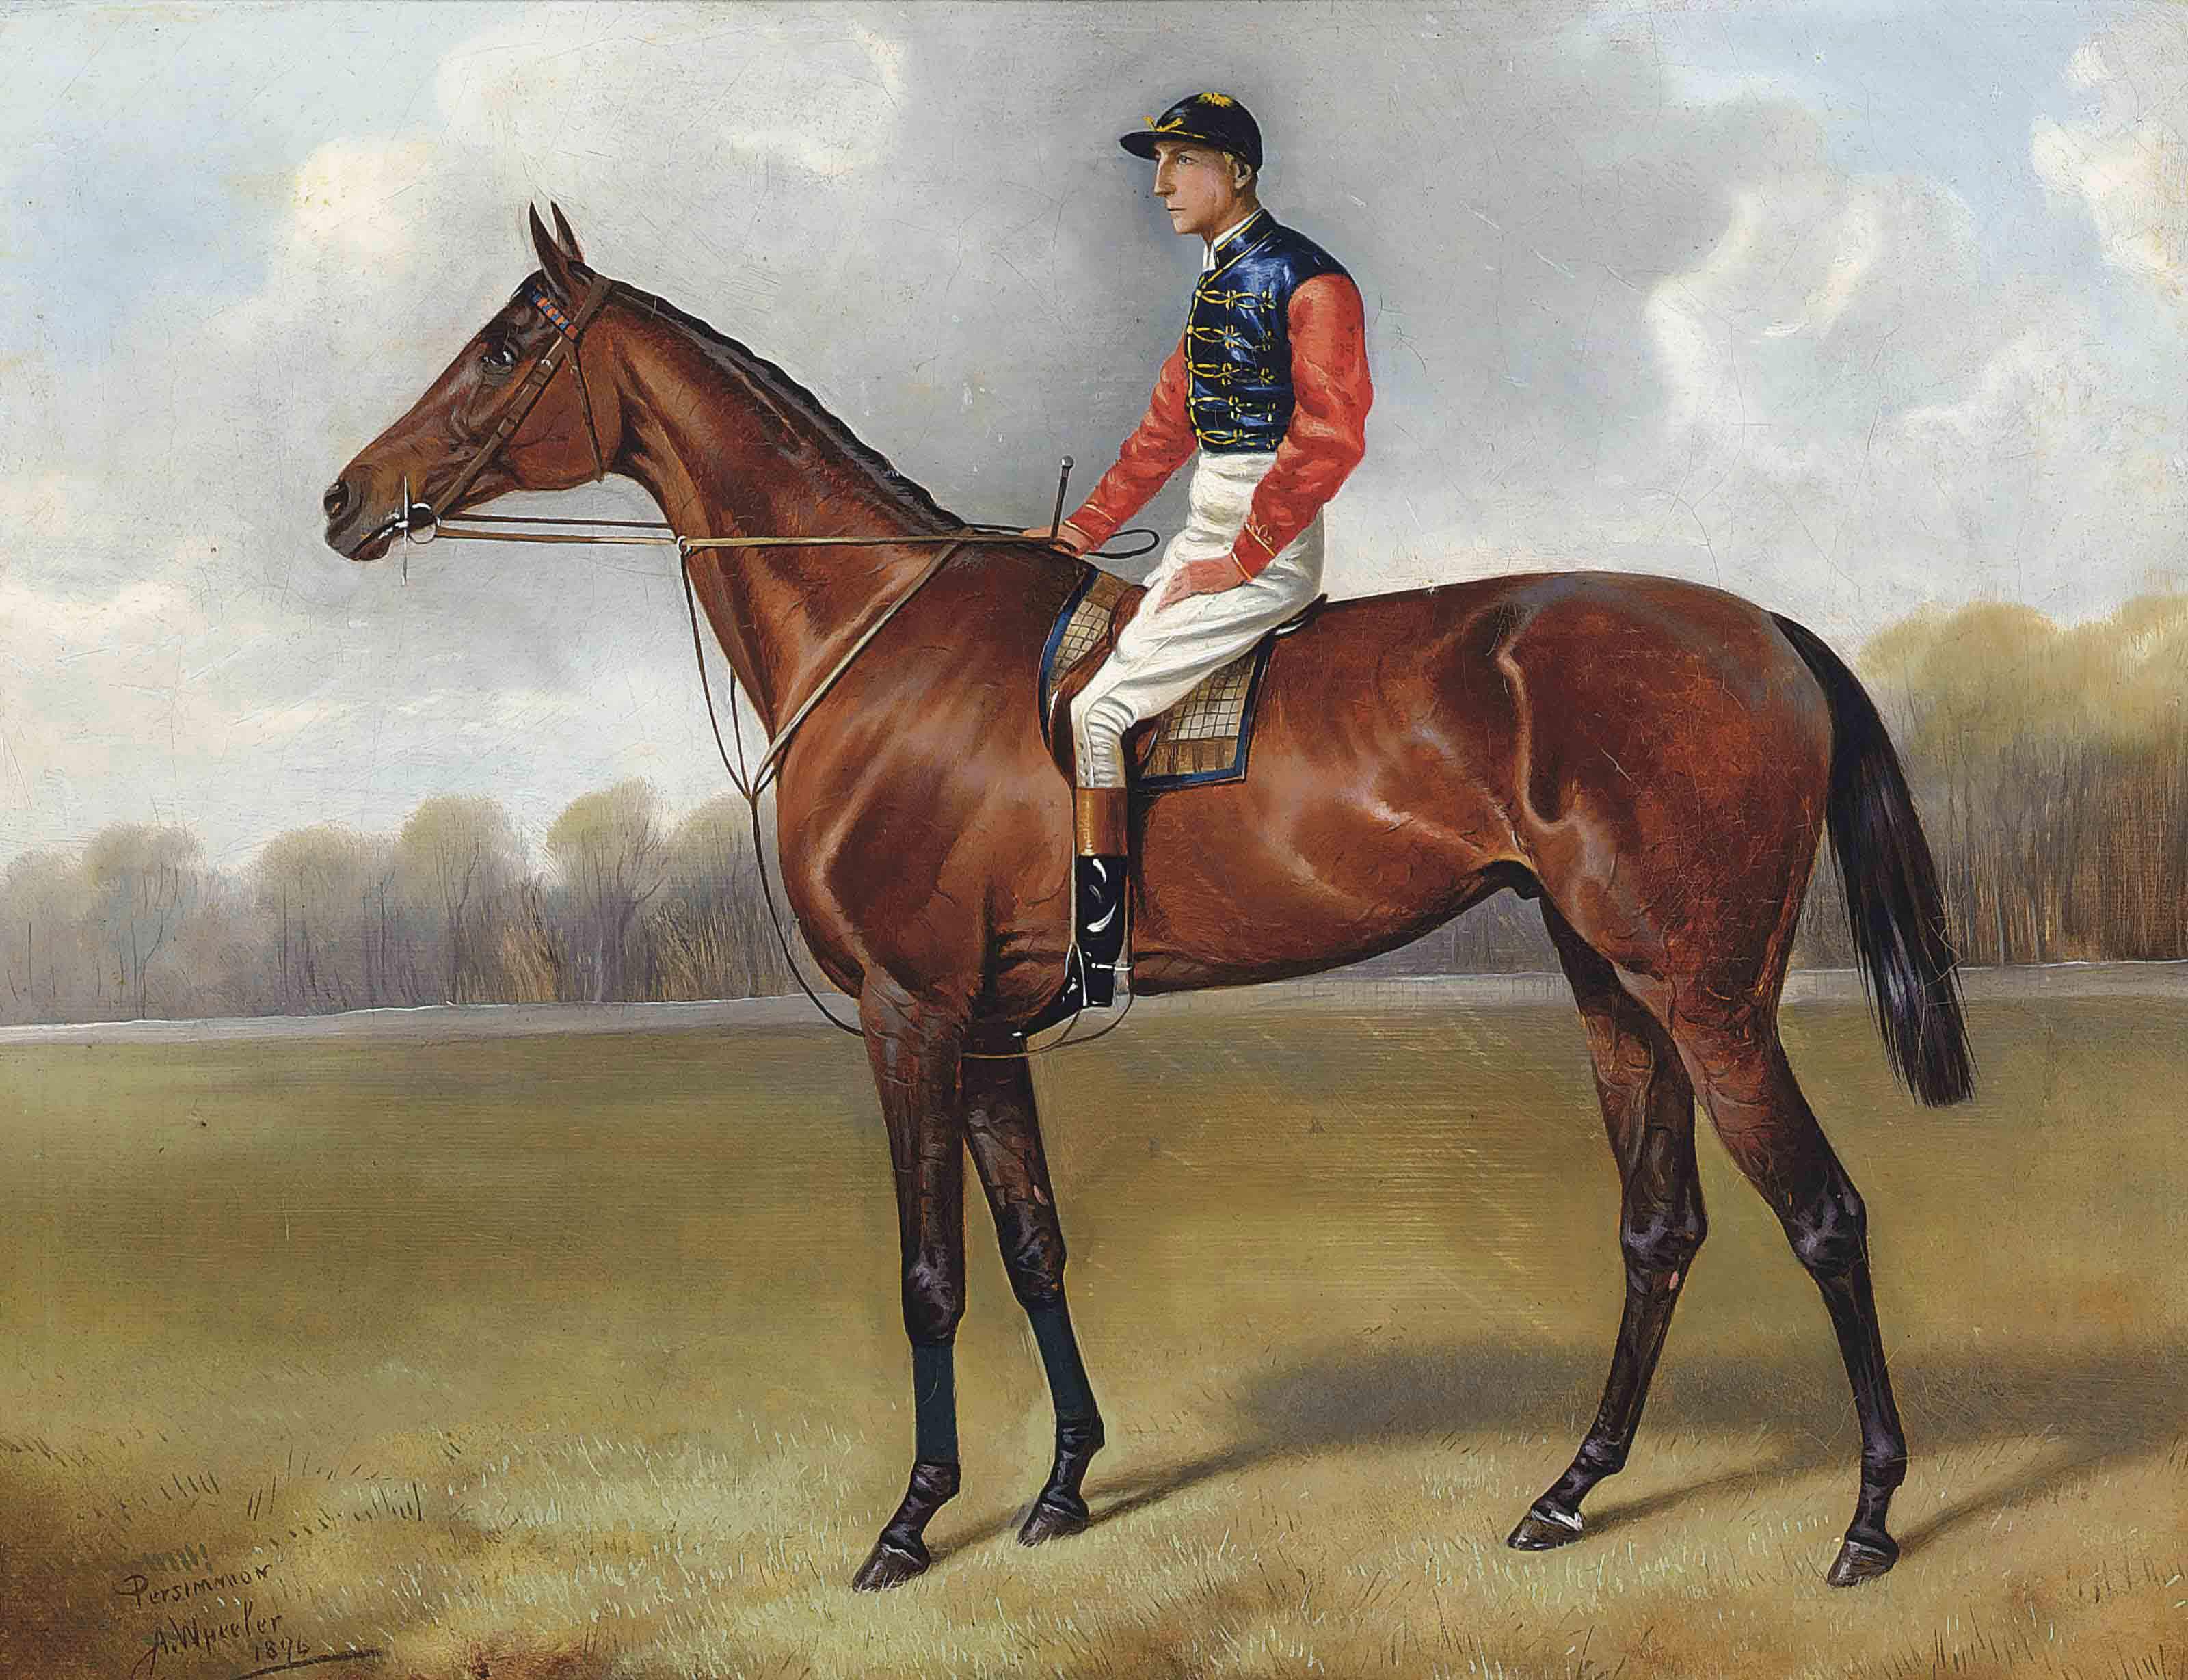 Persimmon, with jockey up